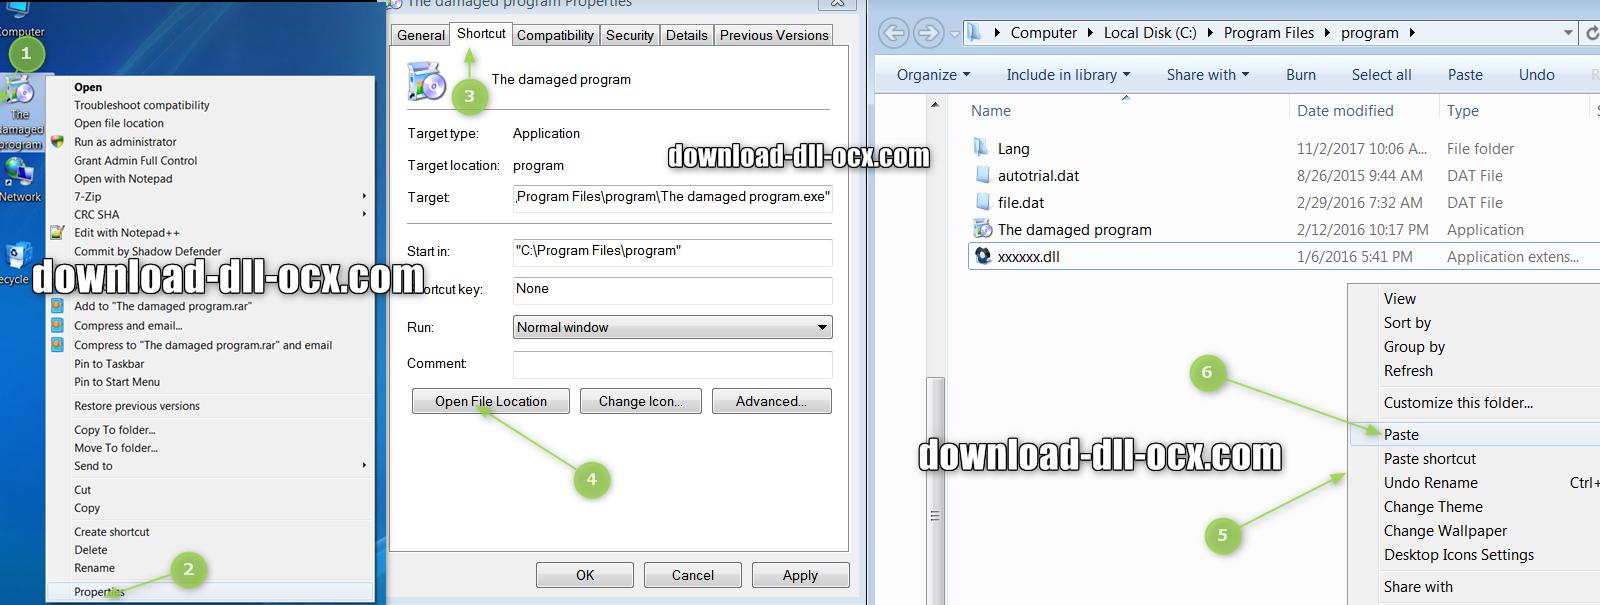 how to install Tapisrv.dll file? for fix missing